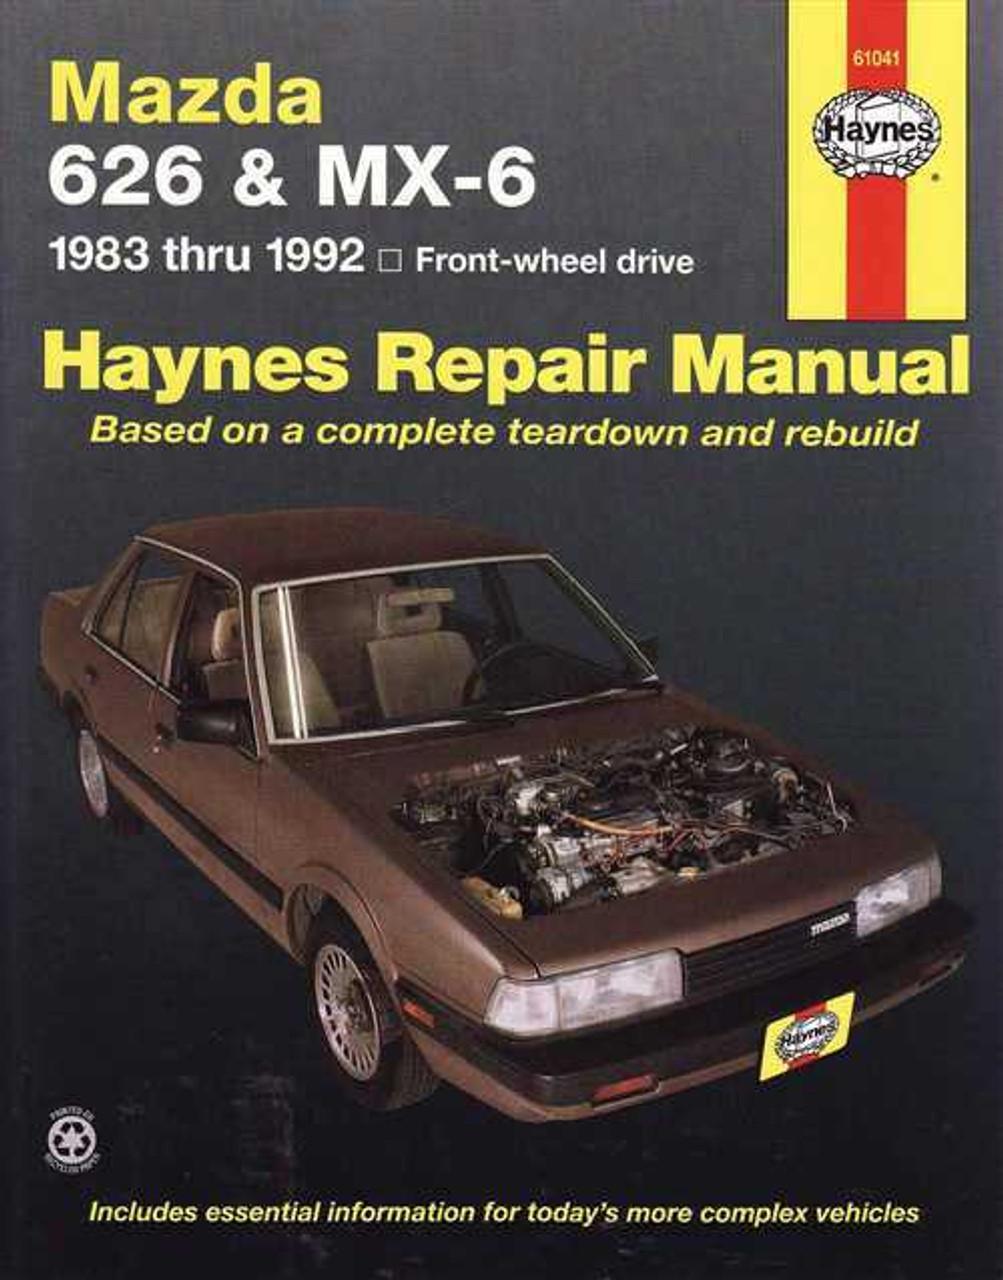 mazda 626 amp mx 6 1983 1992 workshop manual rh automotobookshop com au Mazda 626 Engine Diagram 1997 Mazda 626 Repair Manual